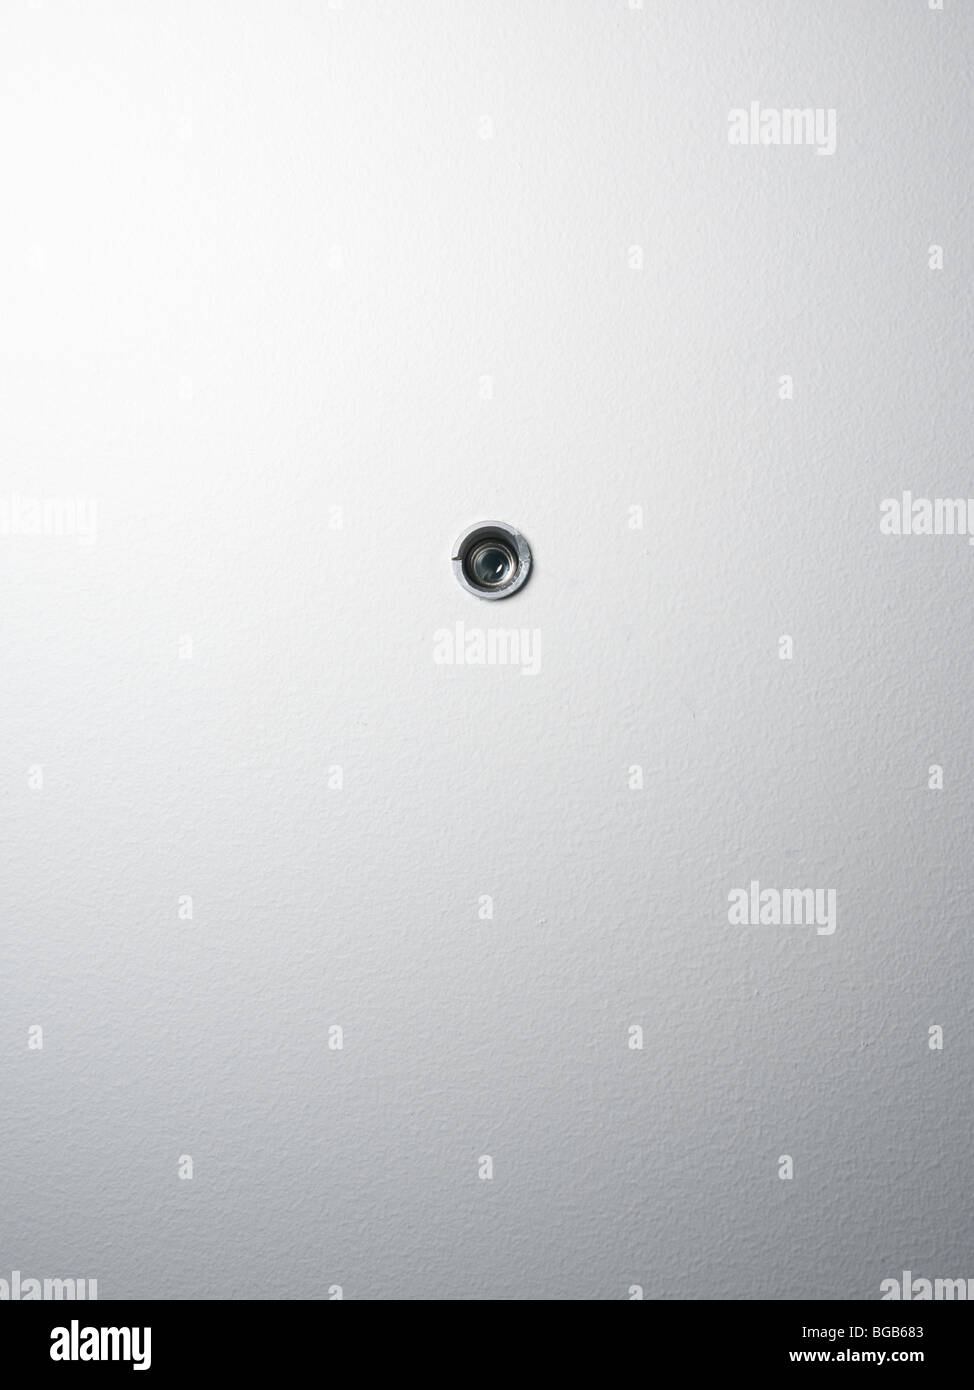 Spy agujero en una puerta Imagen De Stock